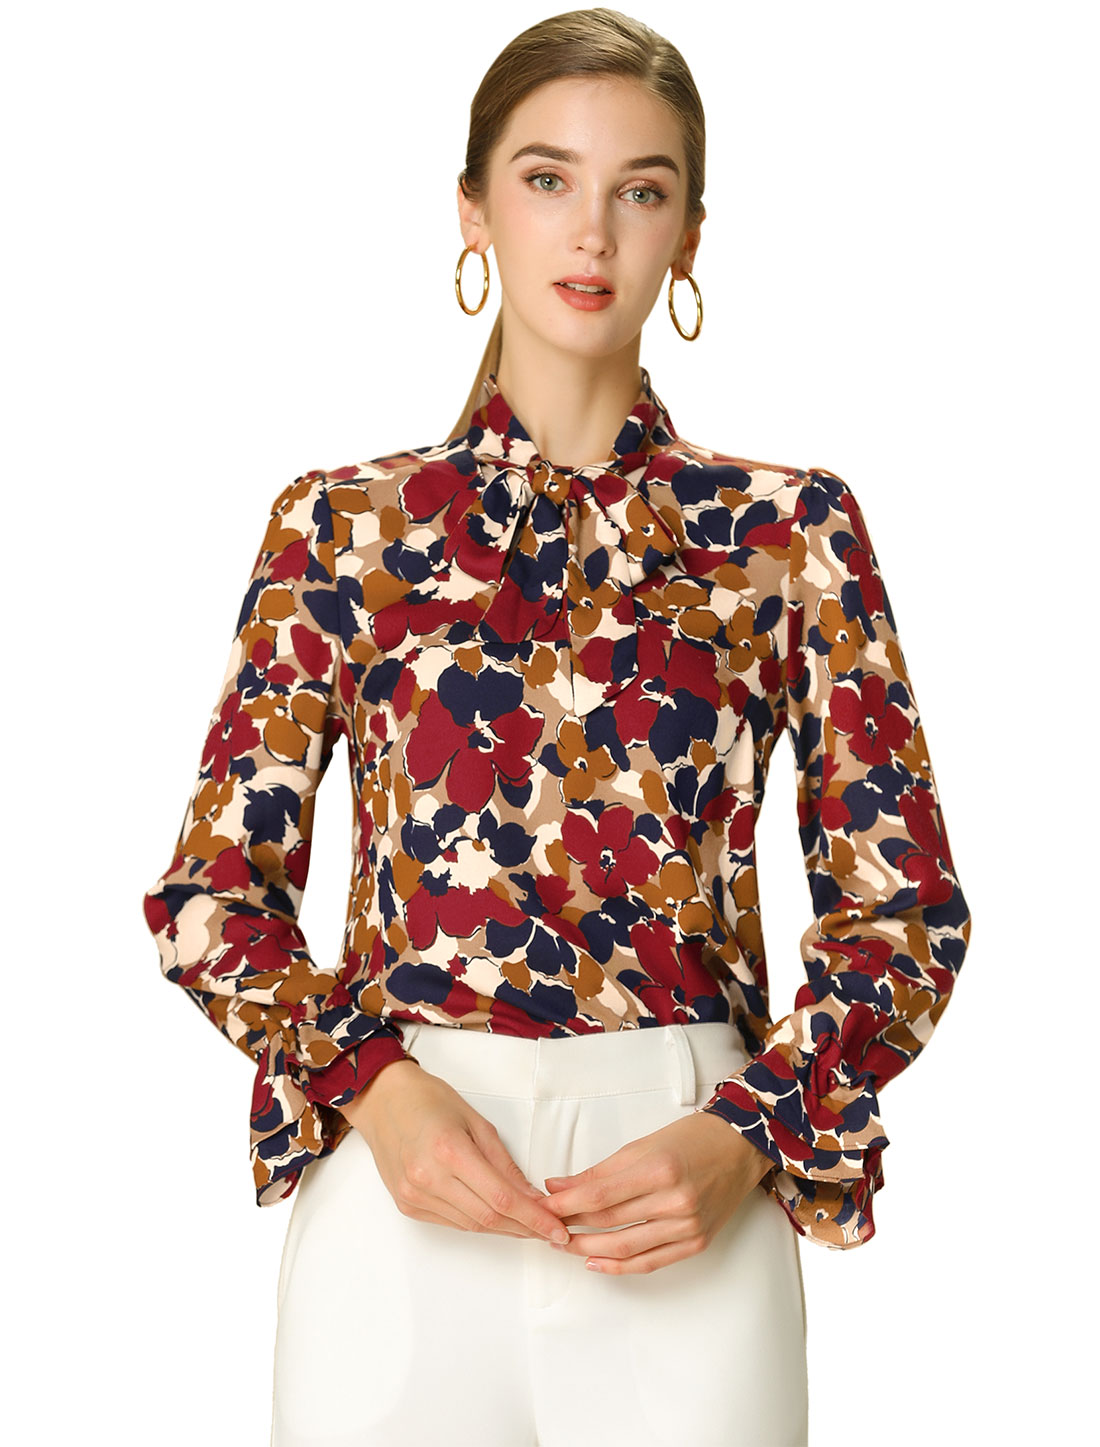 Allegra K Women's Tie Neck Long Sleeve Floral Shirt Red XS (US 2)